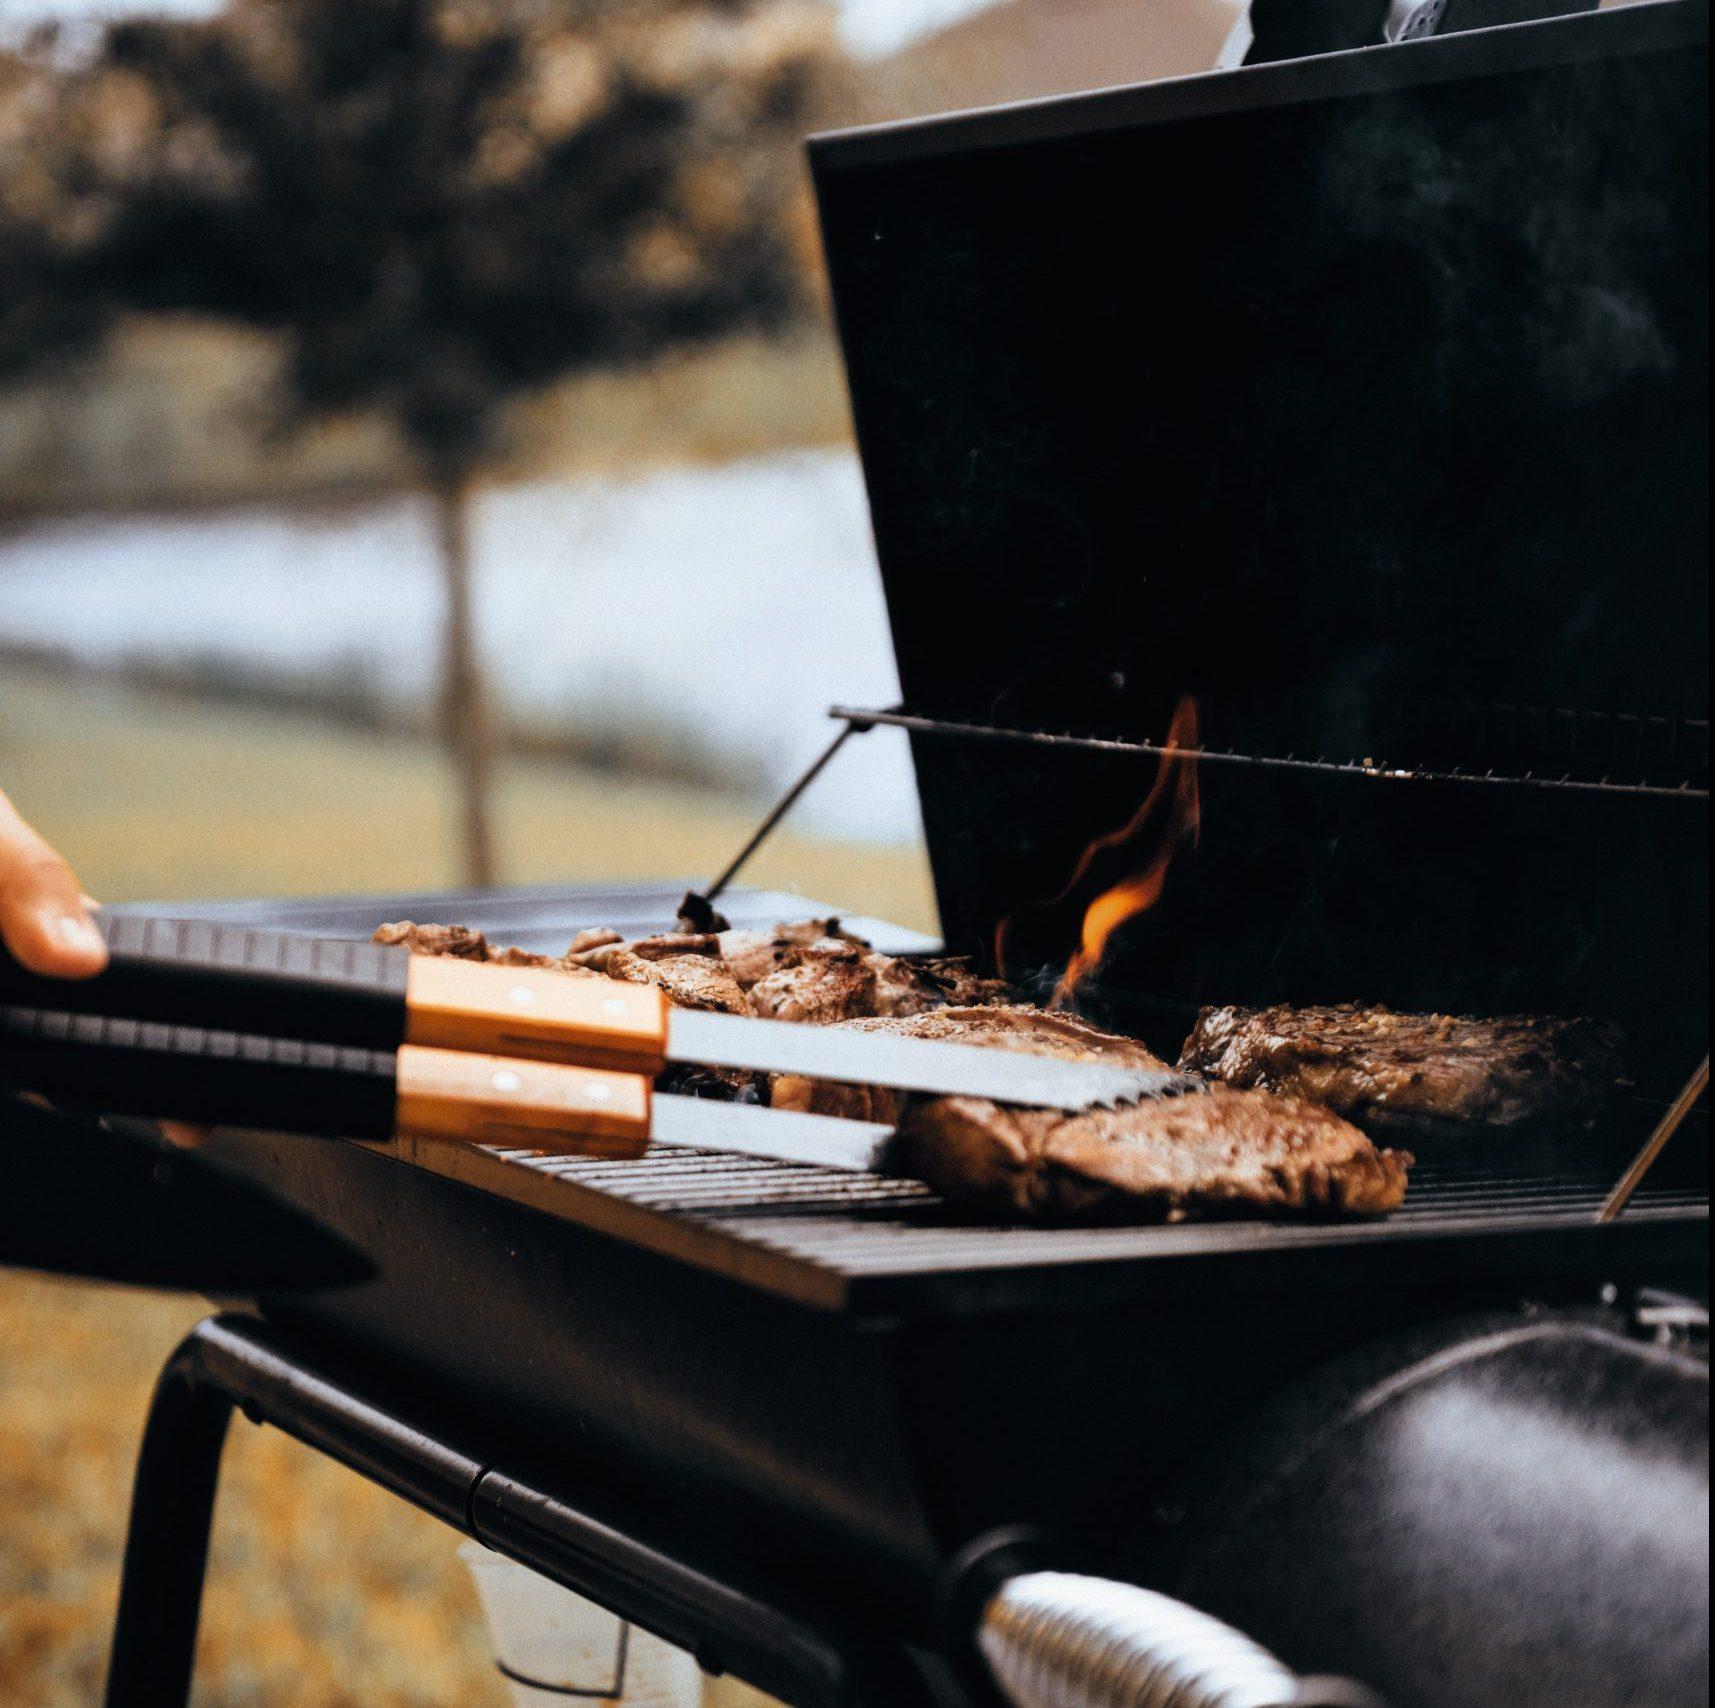 barbecue recepten - barbecue recept - barbecue boeken - barbecue boek recepten